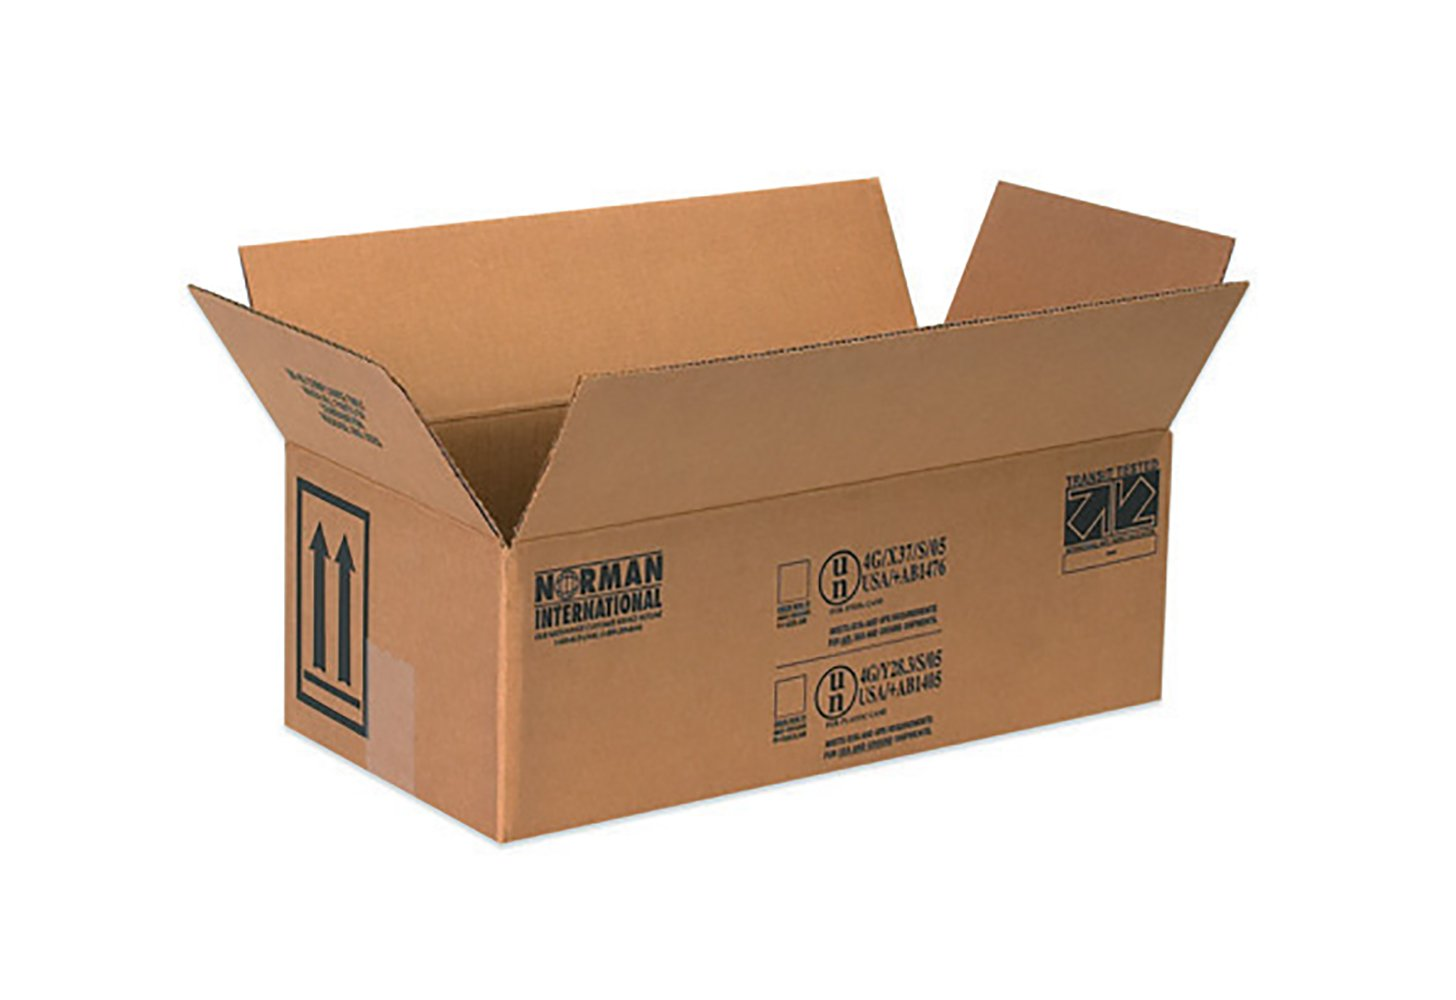 RetailSource B100506HM500 Hazmat Box, 6.1875'' Height, 5.125'' Width, 10.25'' Length, Brown (Pack of 500)